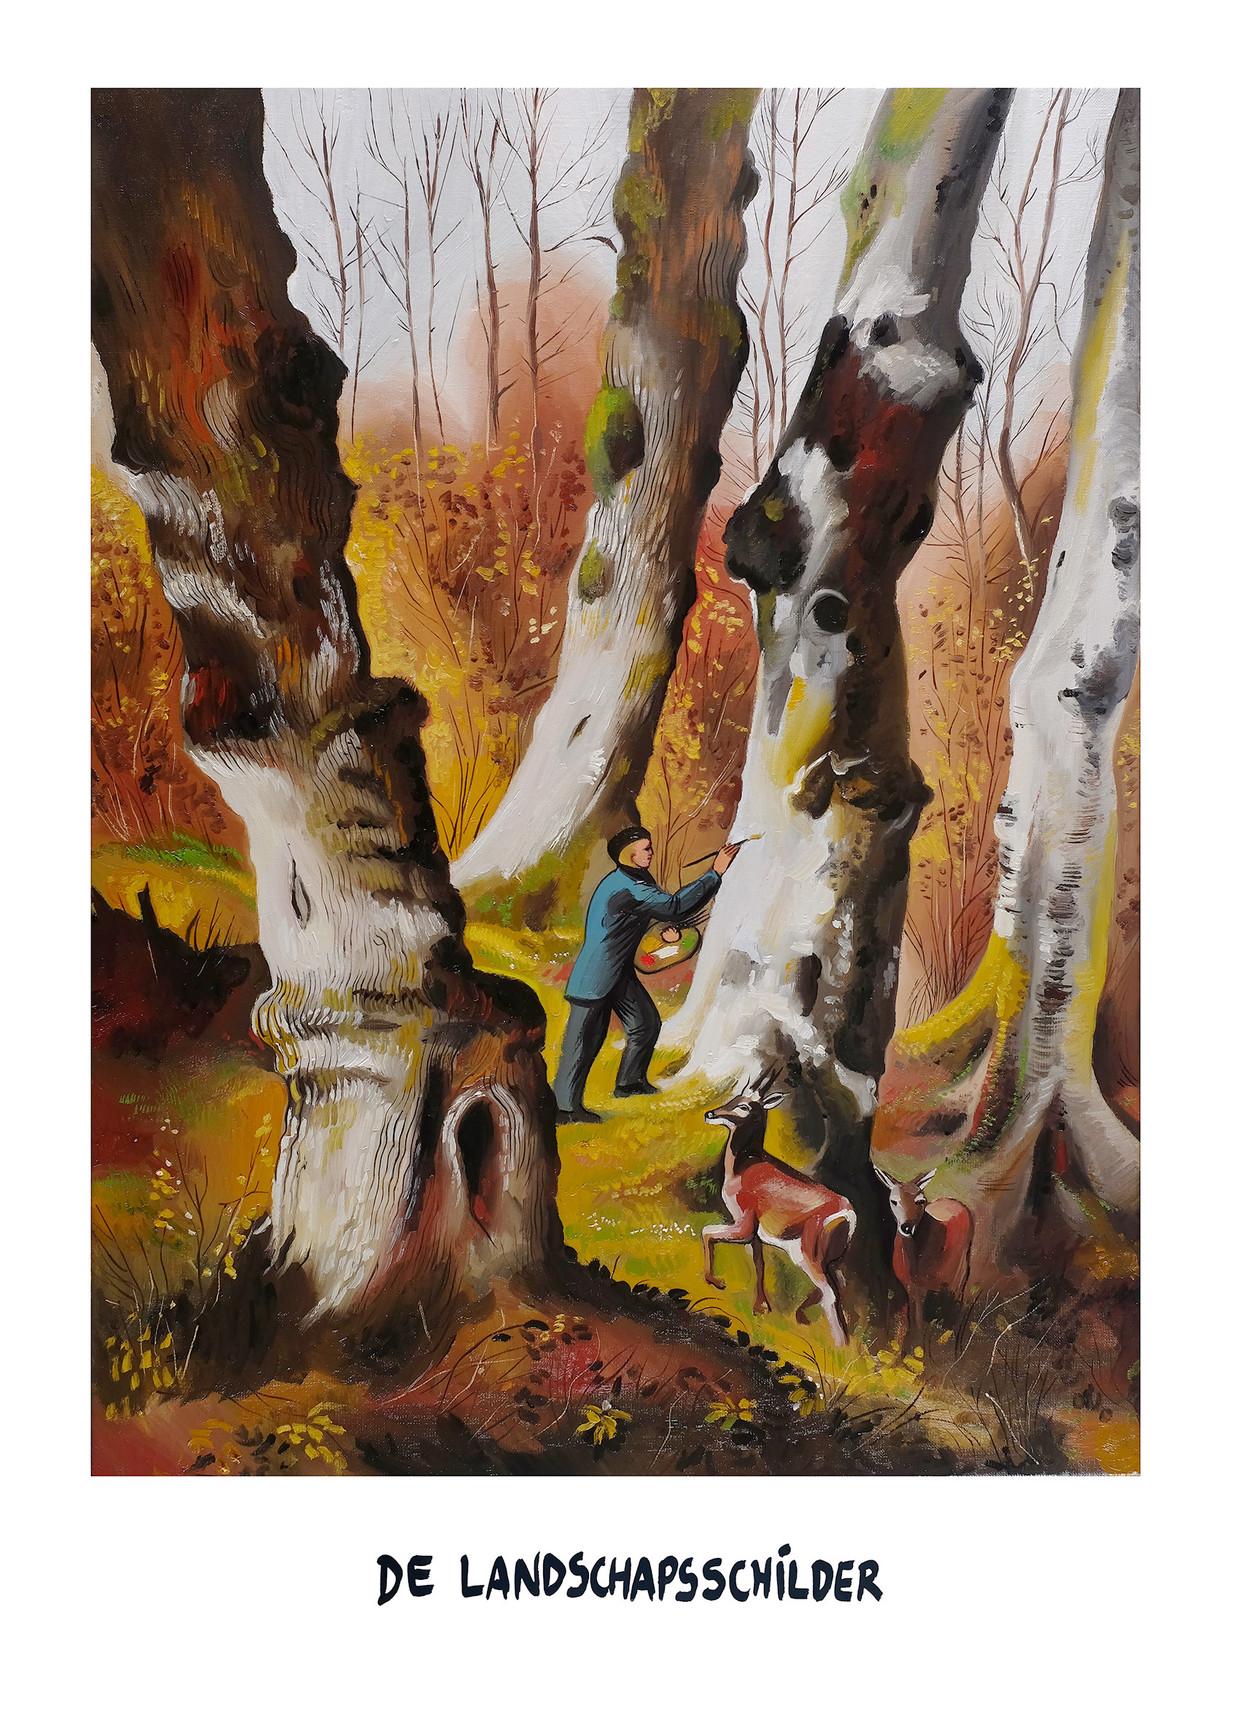 Kama & Seele: de landschapsschilder Beeld Kamagurka & Herr Seele